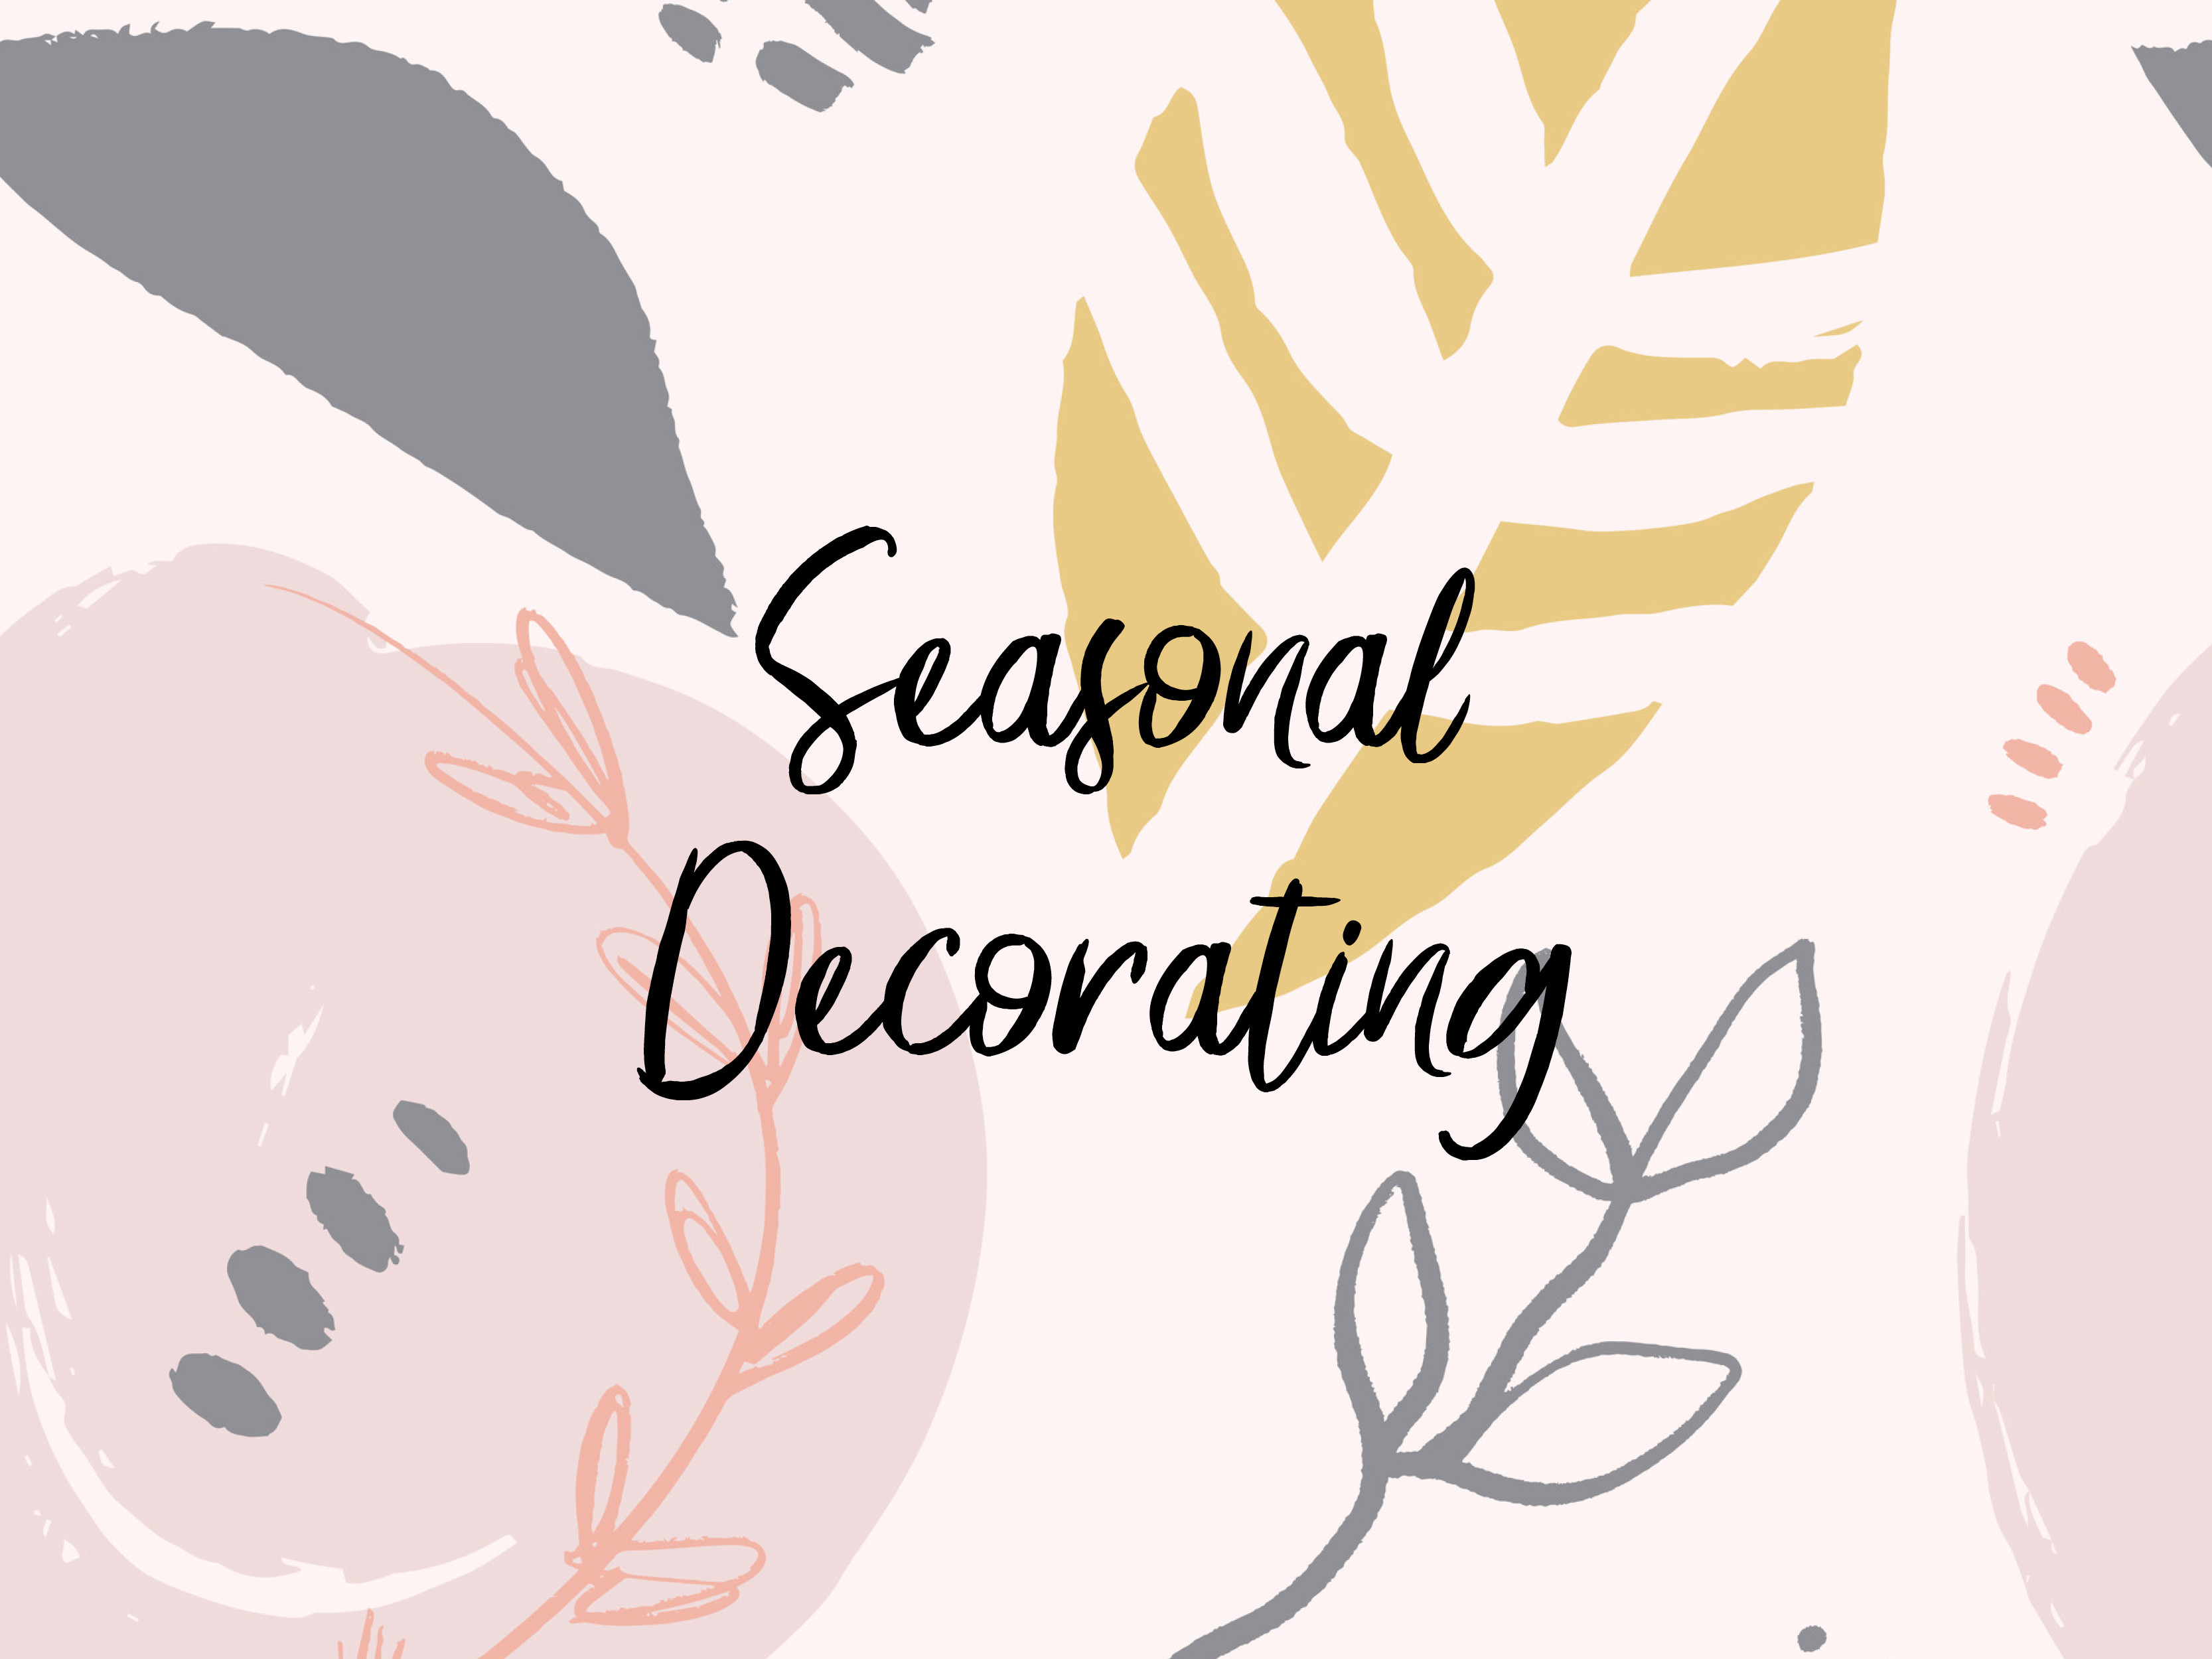 Seasonal Decorating Consultation